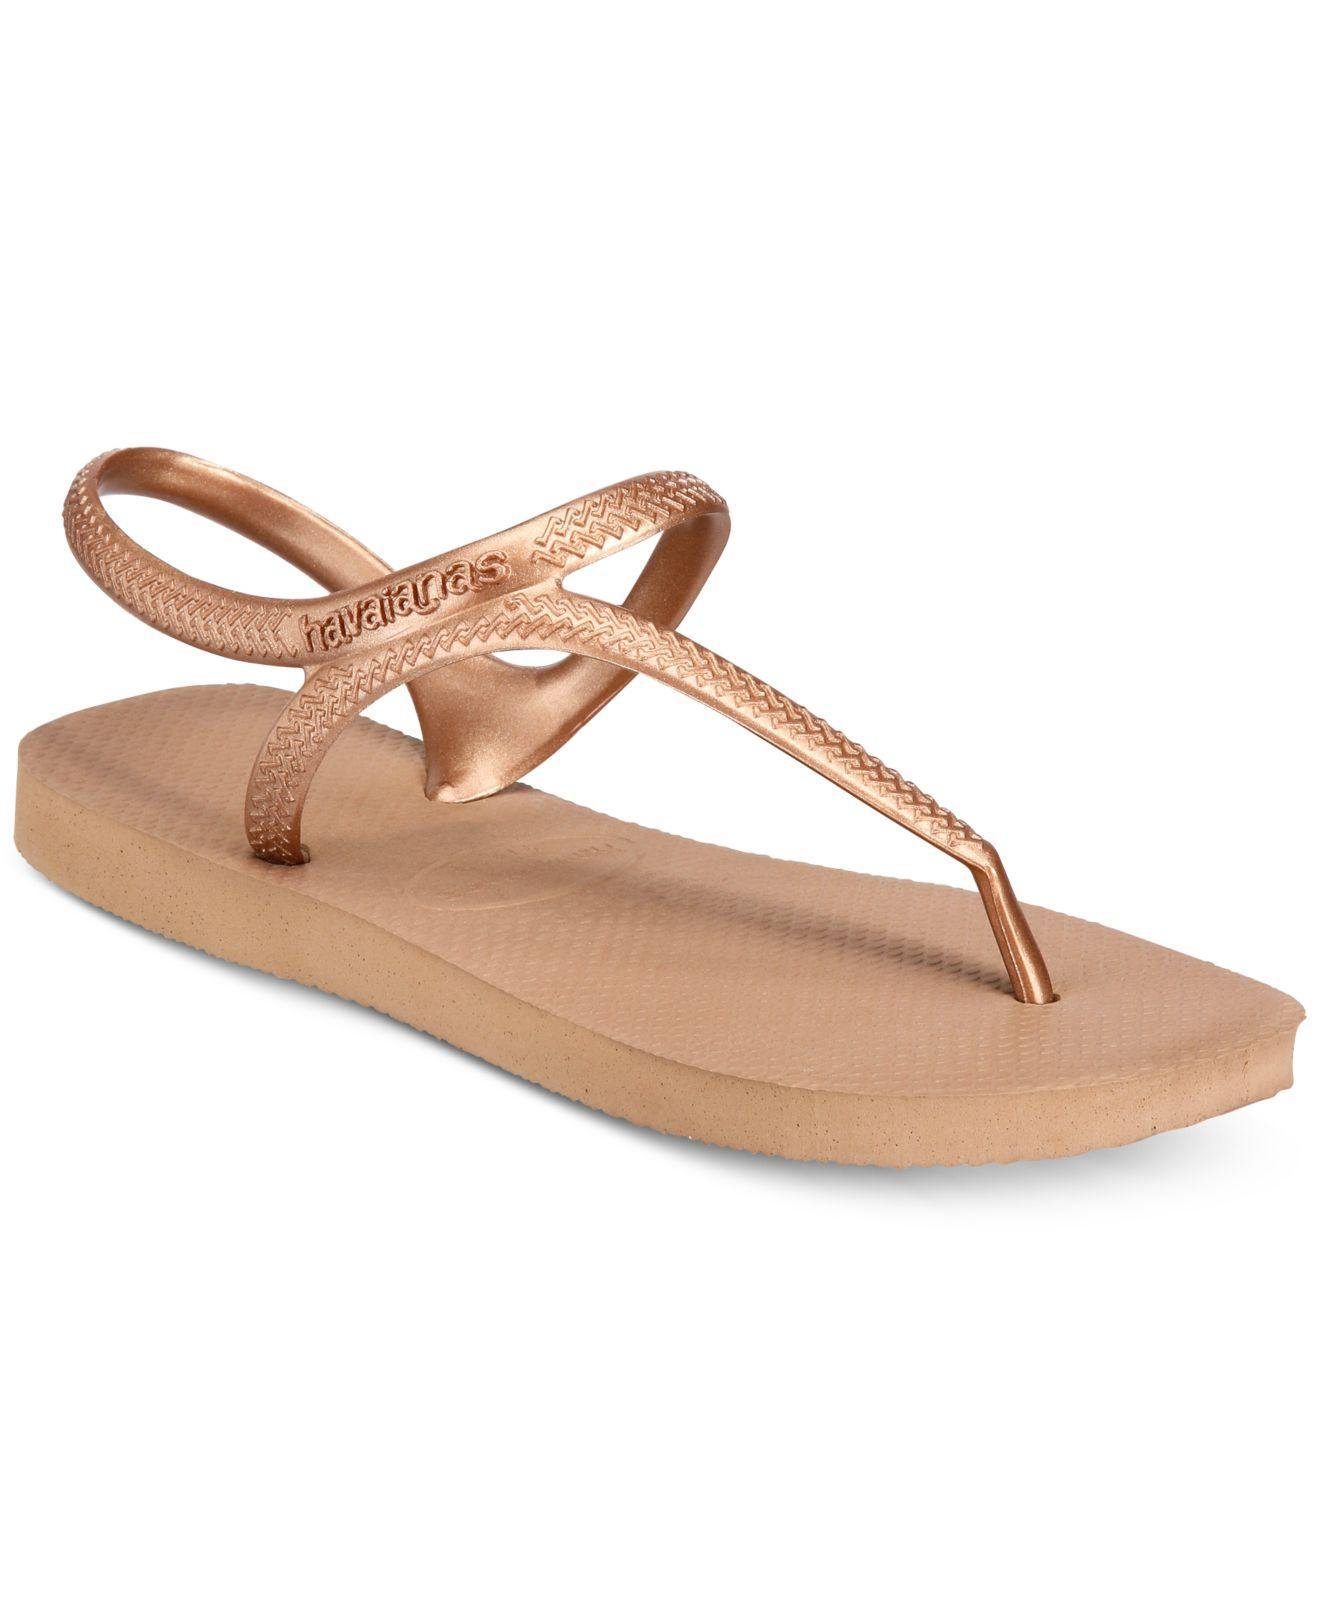 83c381413 Havaianas - Multicolor Flash Urban Flip-flop Sandals - Lyst. View fullscreen